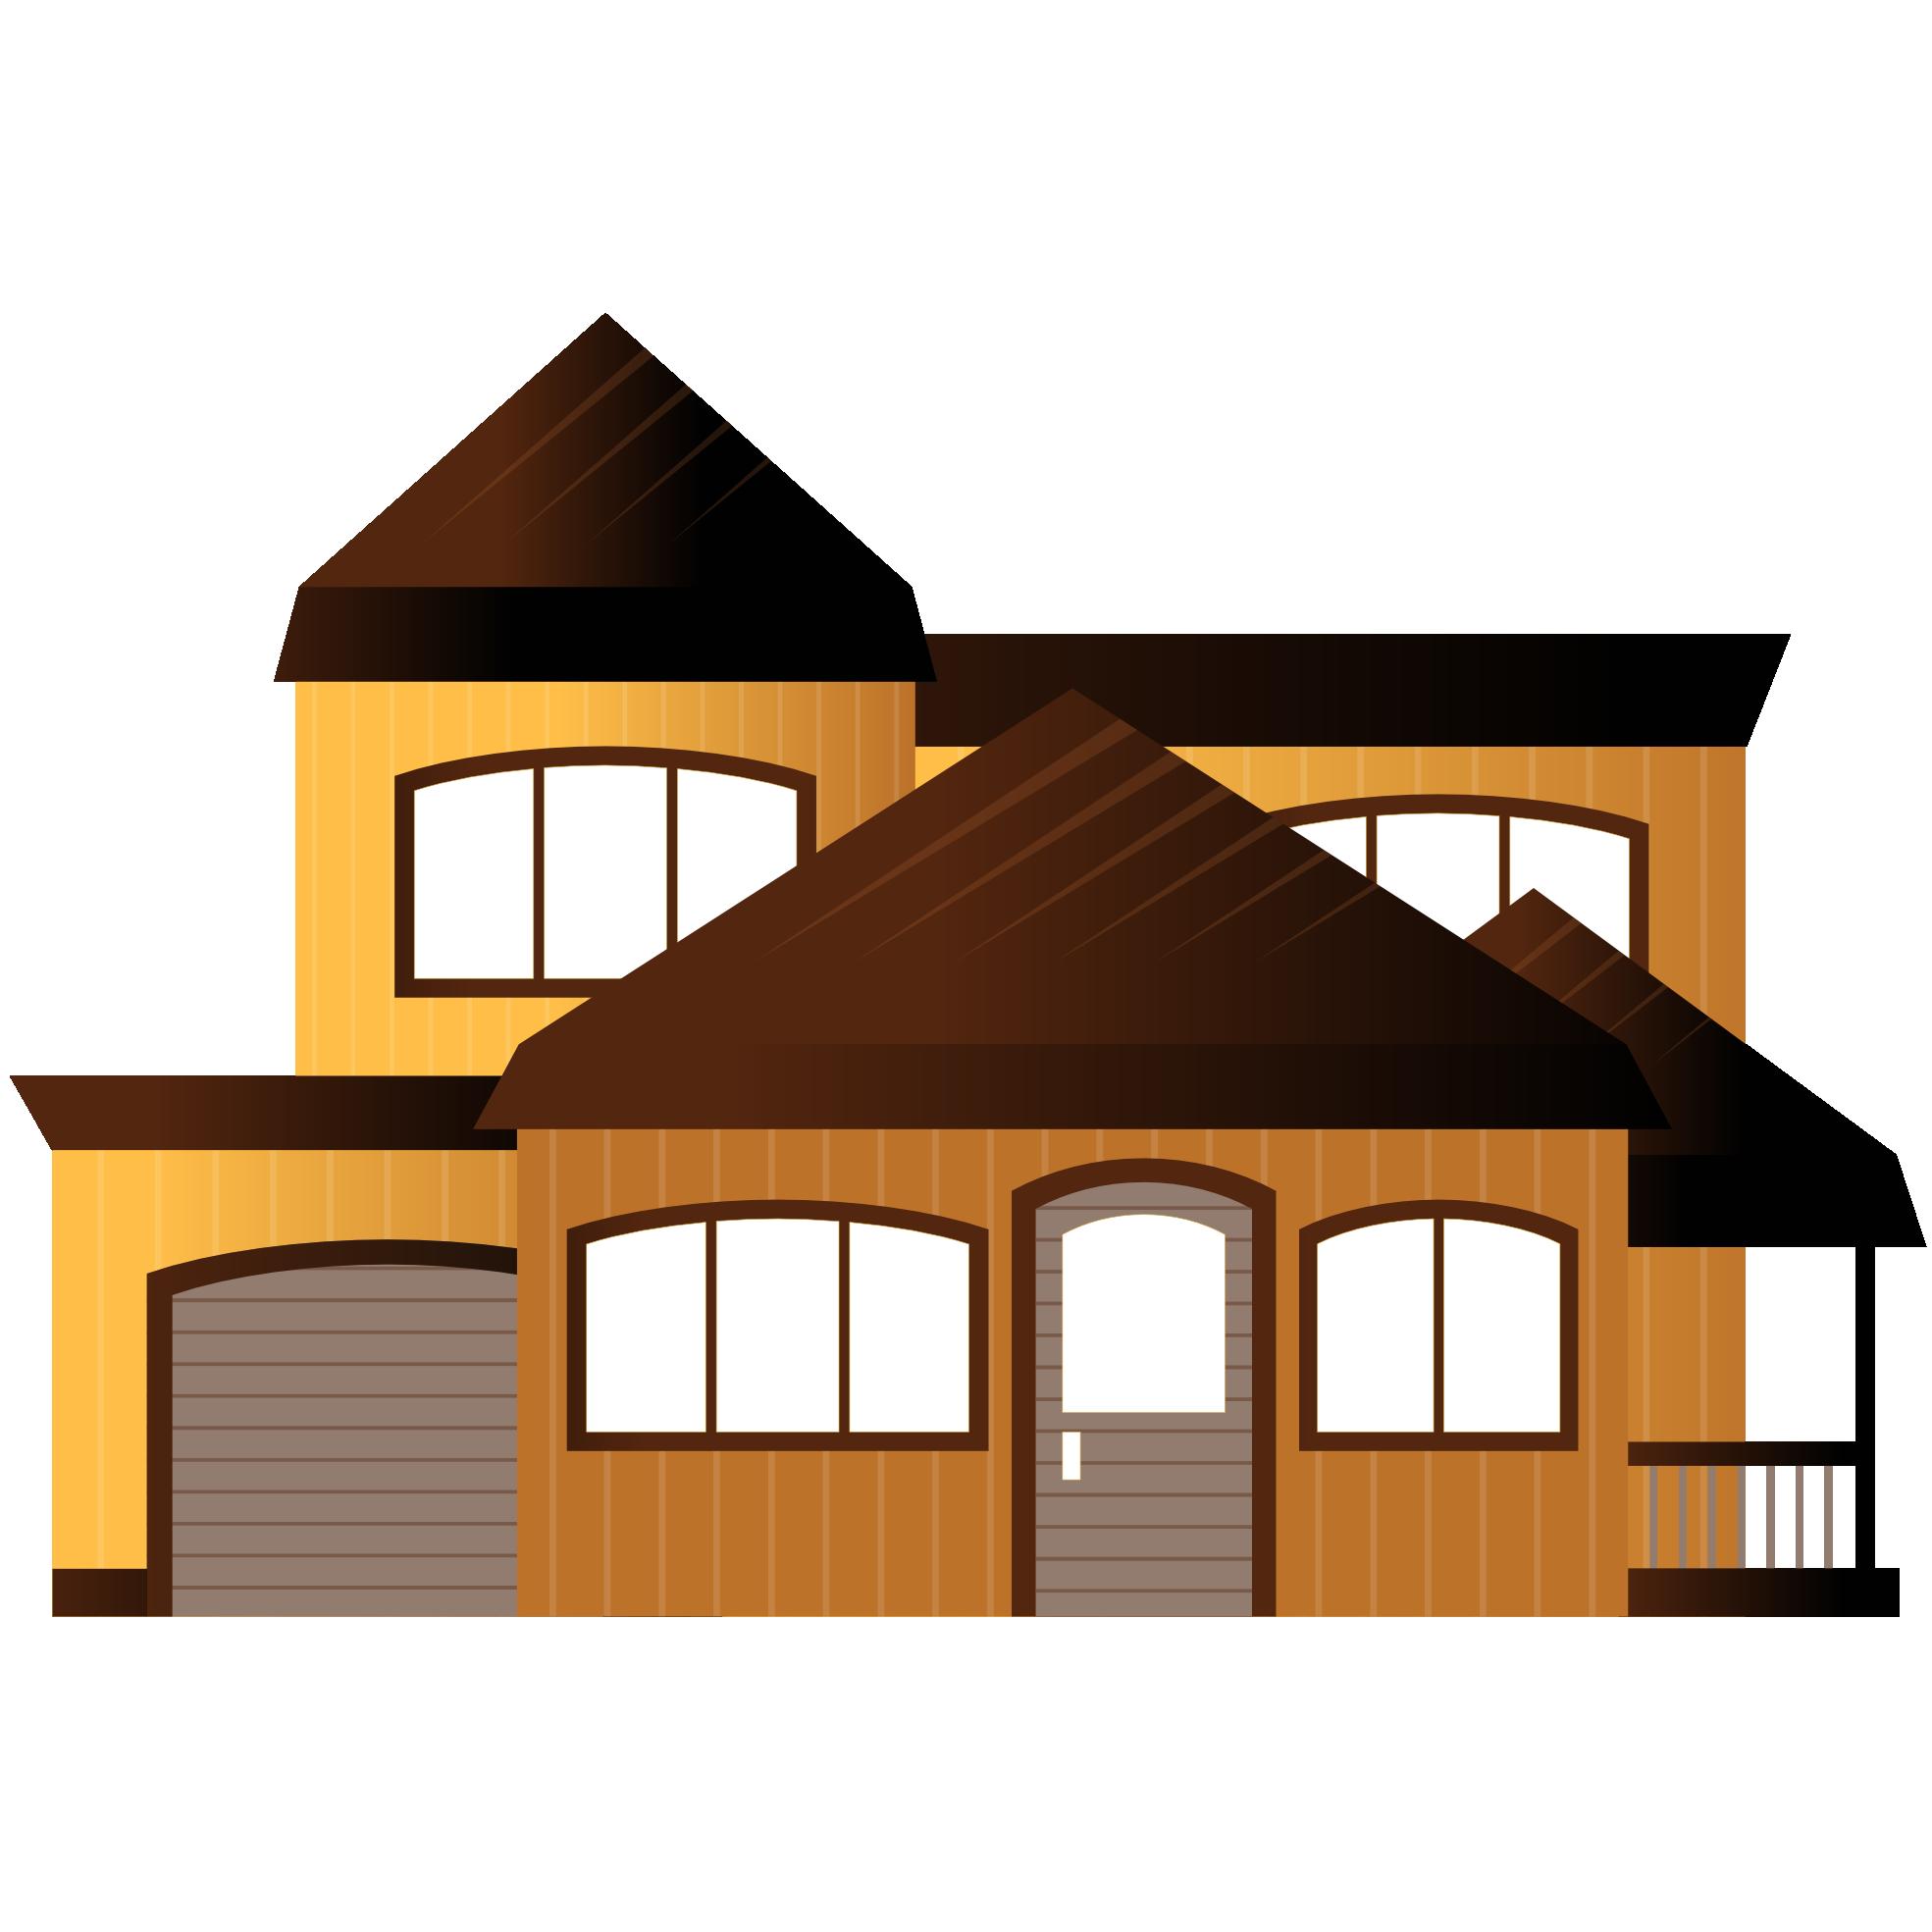 Mansion house design